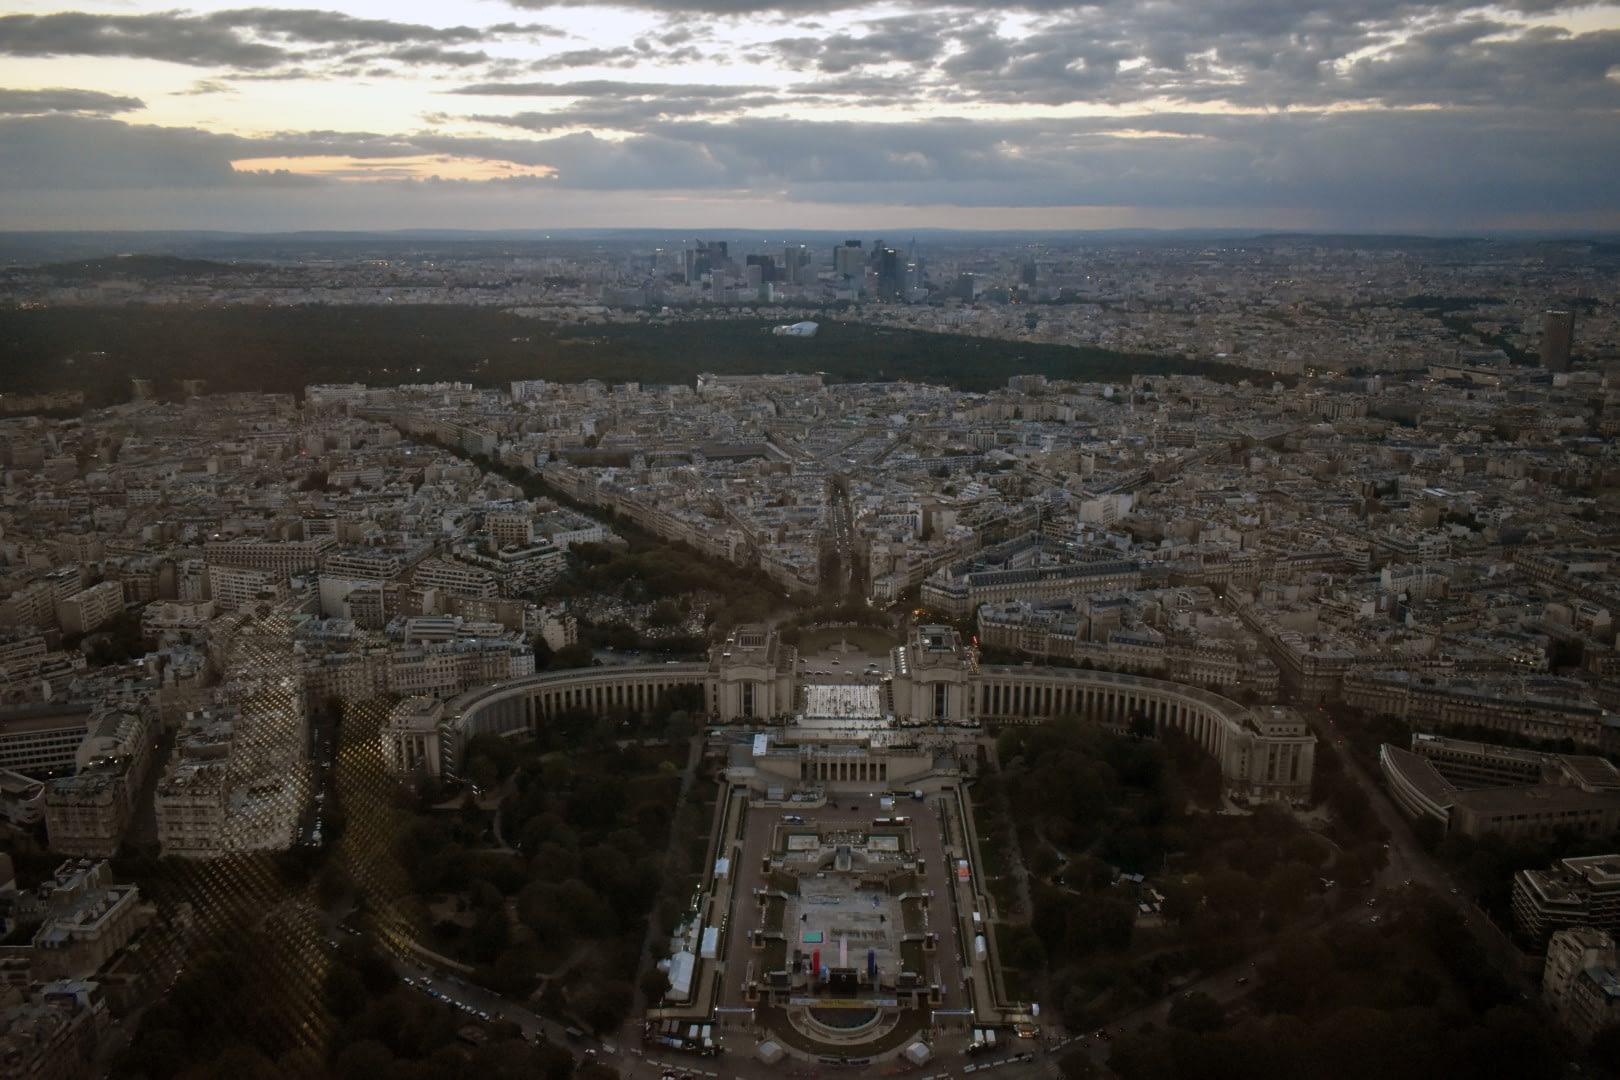 Trocadéro, top of the Eiffel Tower, Paris